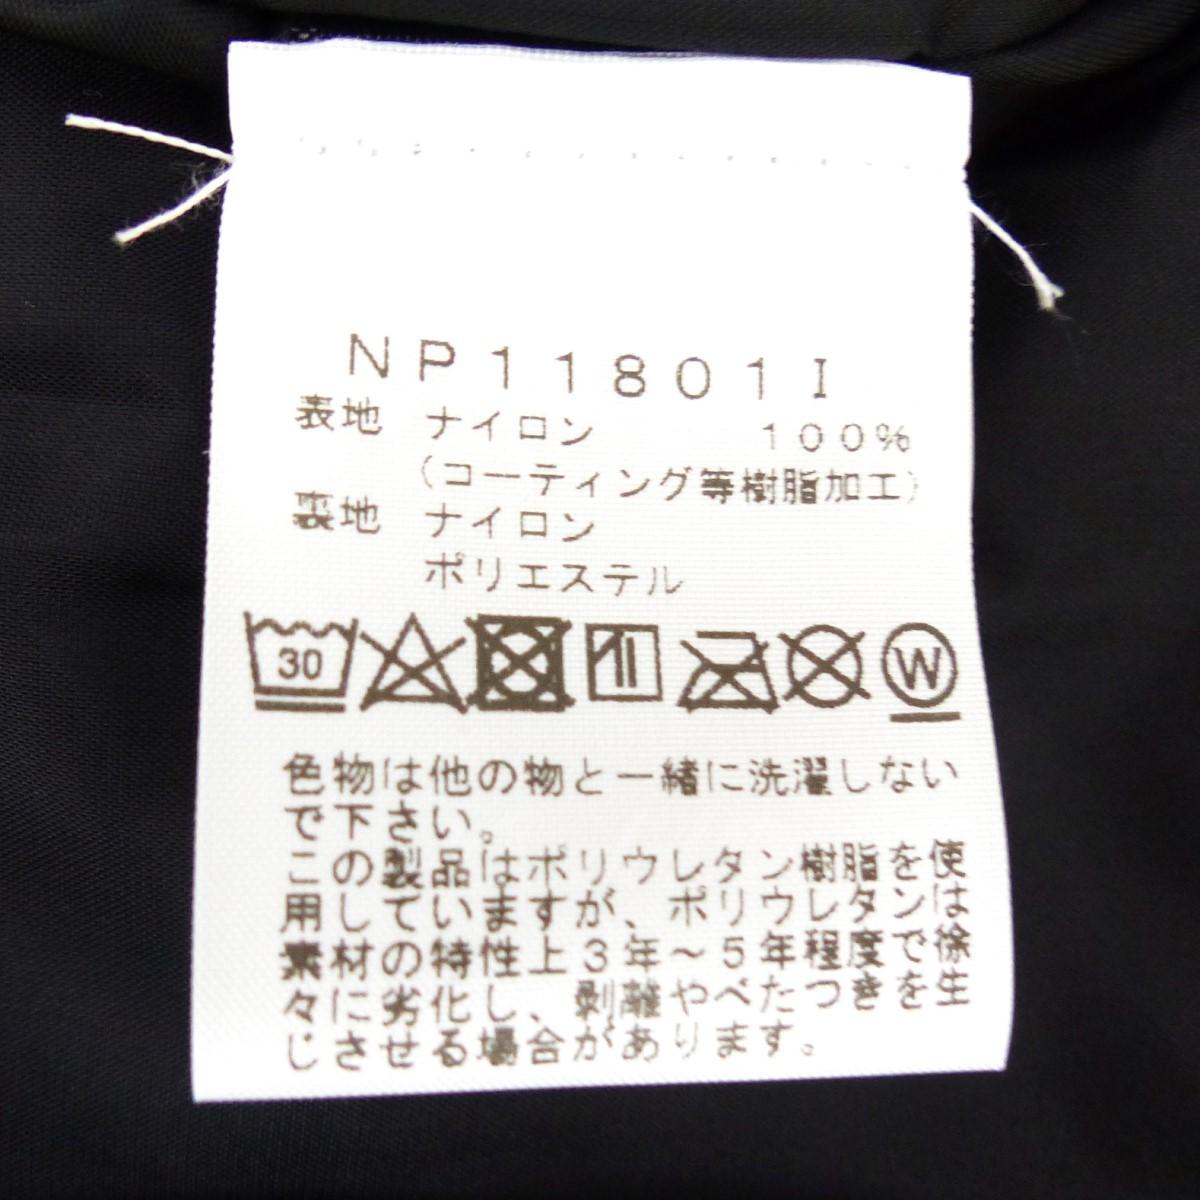 【】SUPREME×THENORTHFACE2018SSMetallicMountainParkaローズゴールドサイズ:S【送料無料】【100718】(シュプリームザノースフェイス)